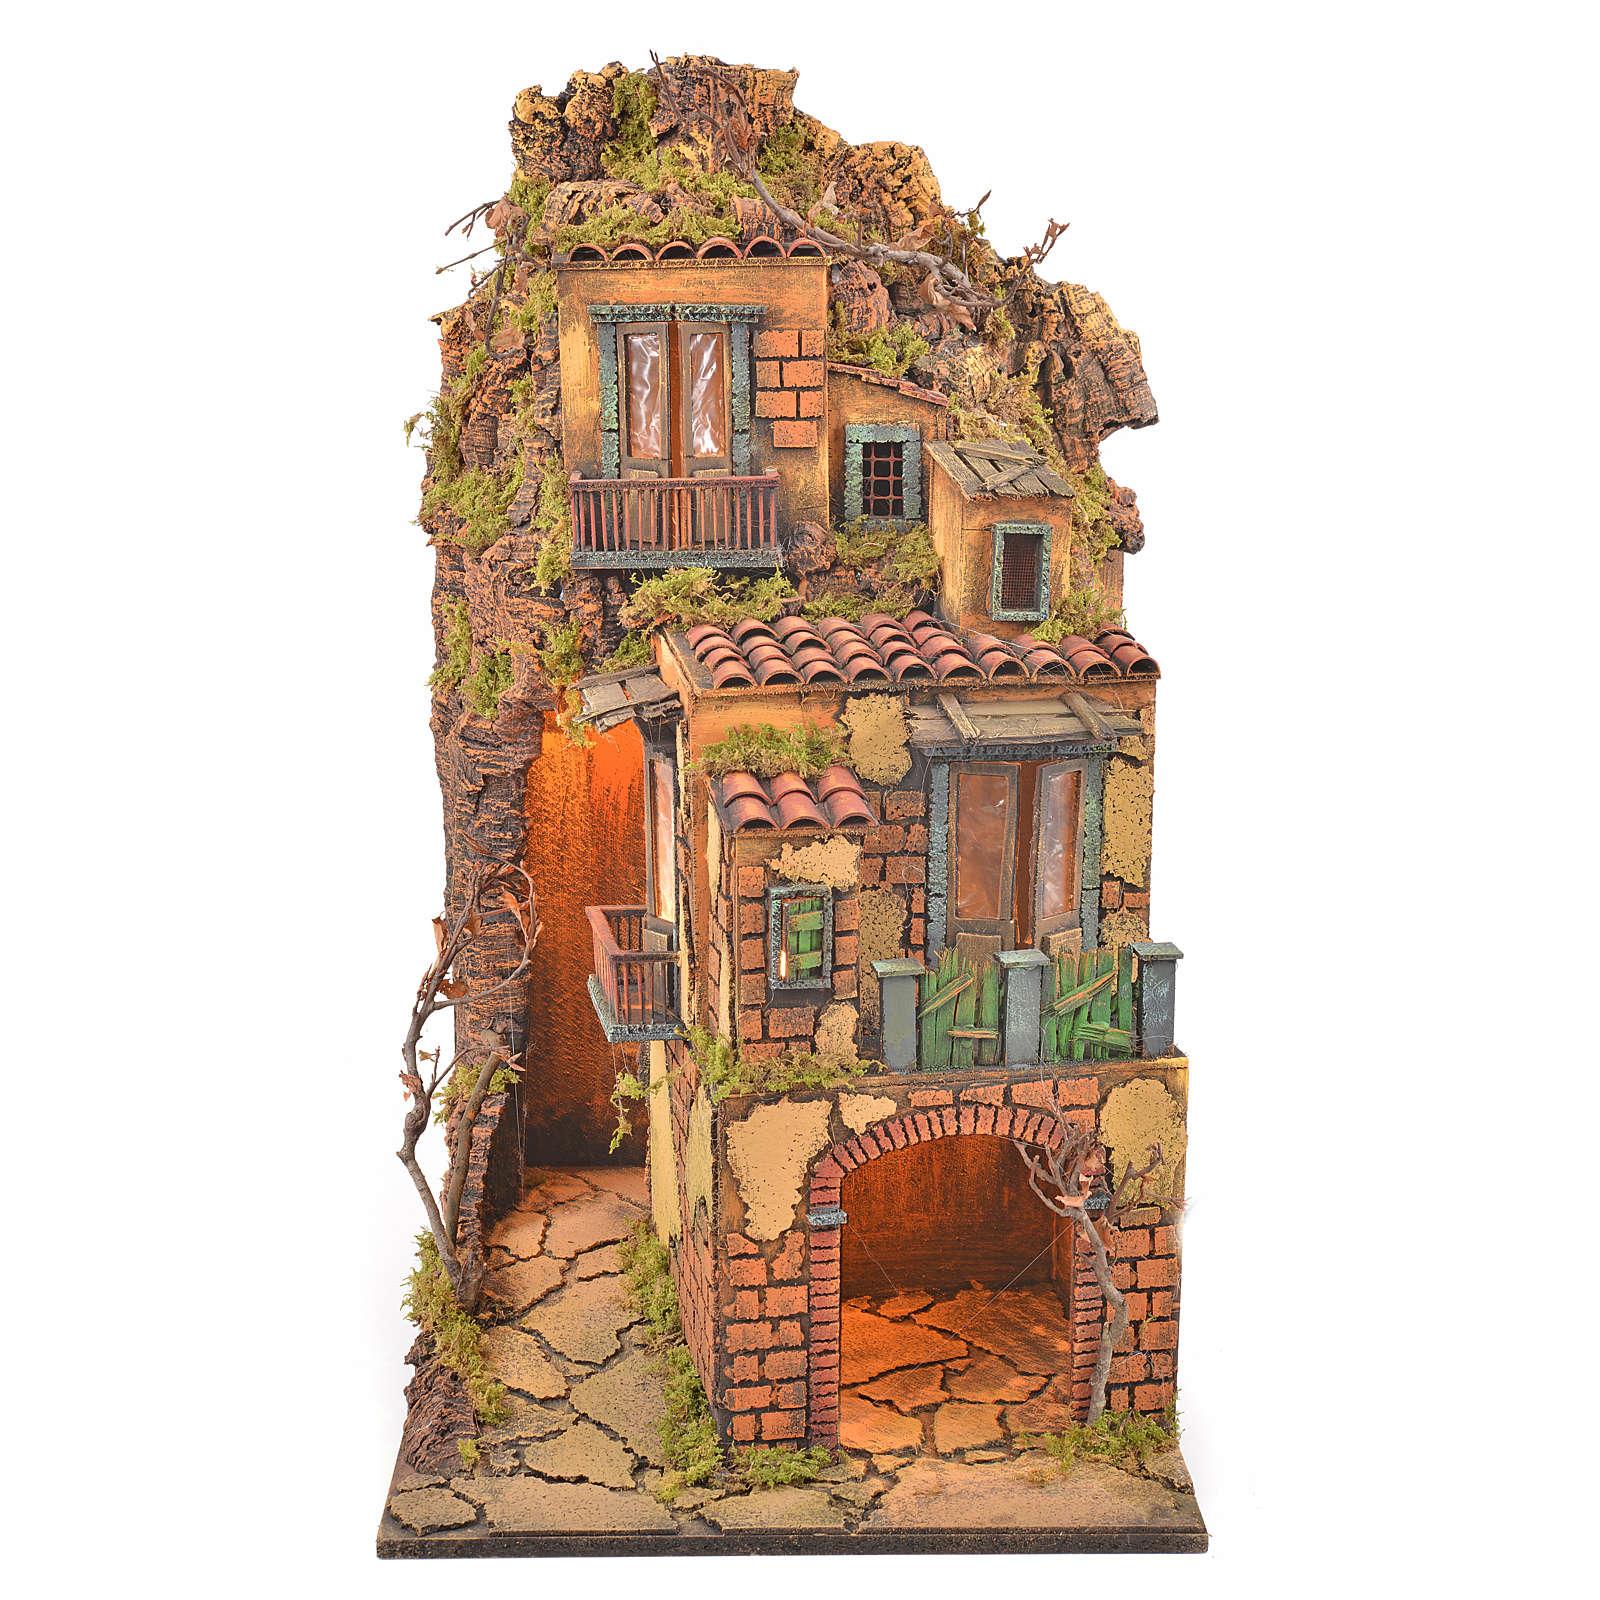 Borgo presepe napoletano stile 700 torre luce 65x45x37 4